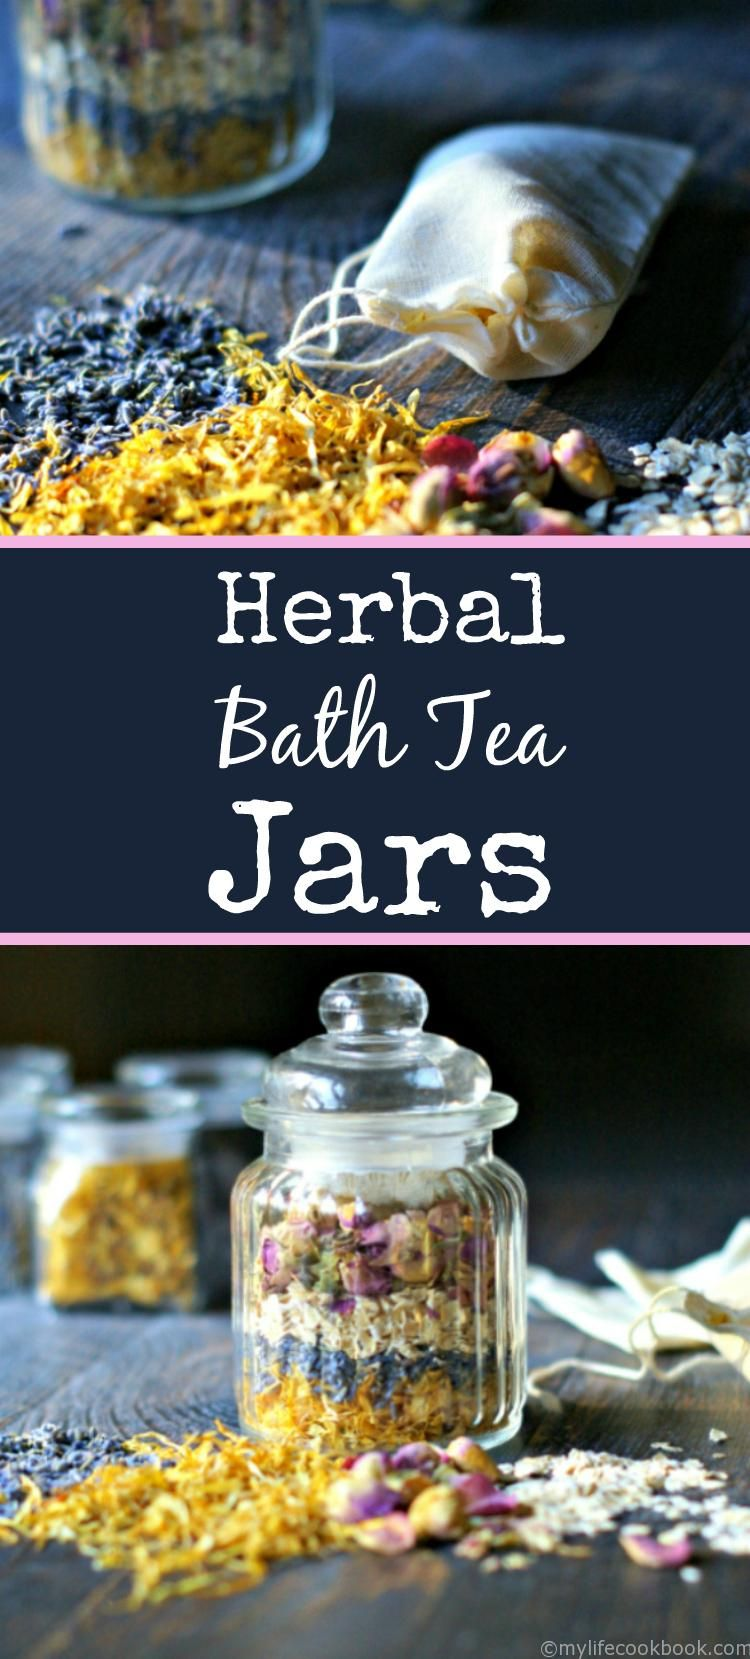 Herbal Bath Tea Jars | Recipe | Bath recipes, Bath tea ...